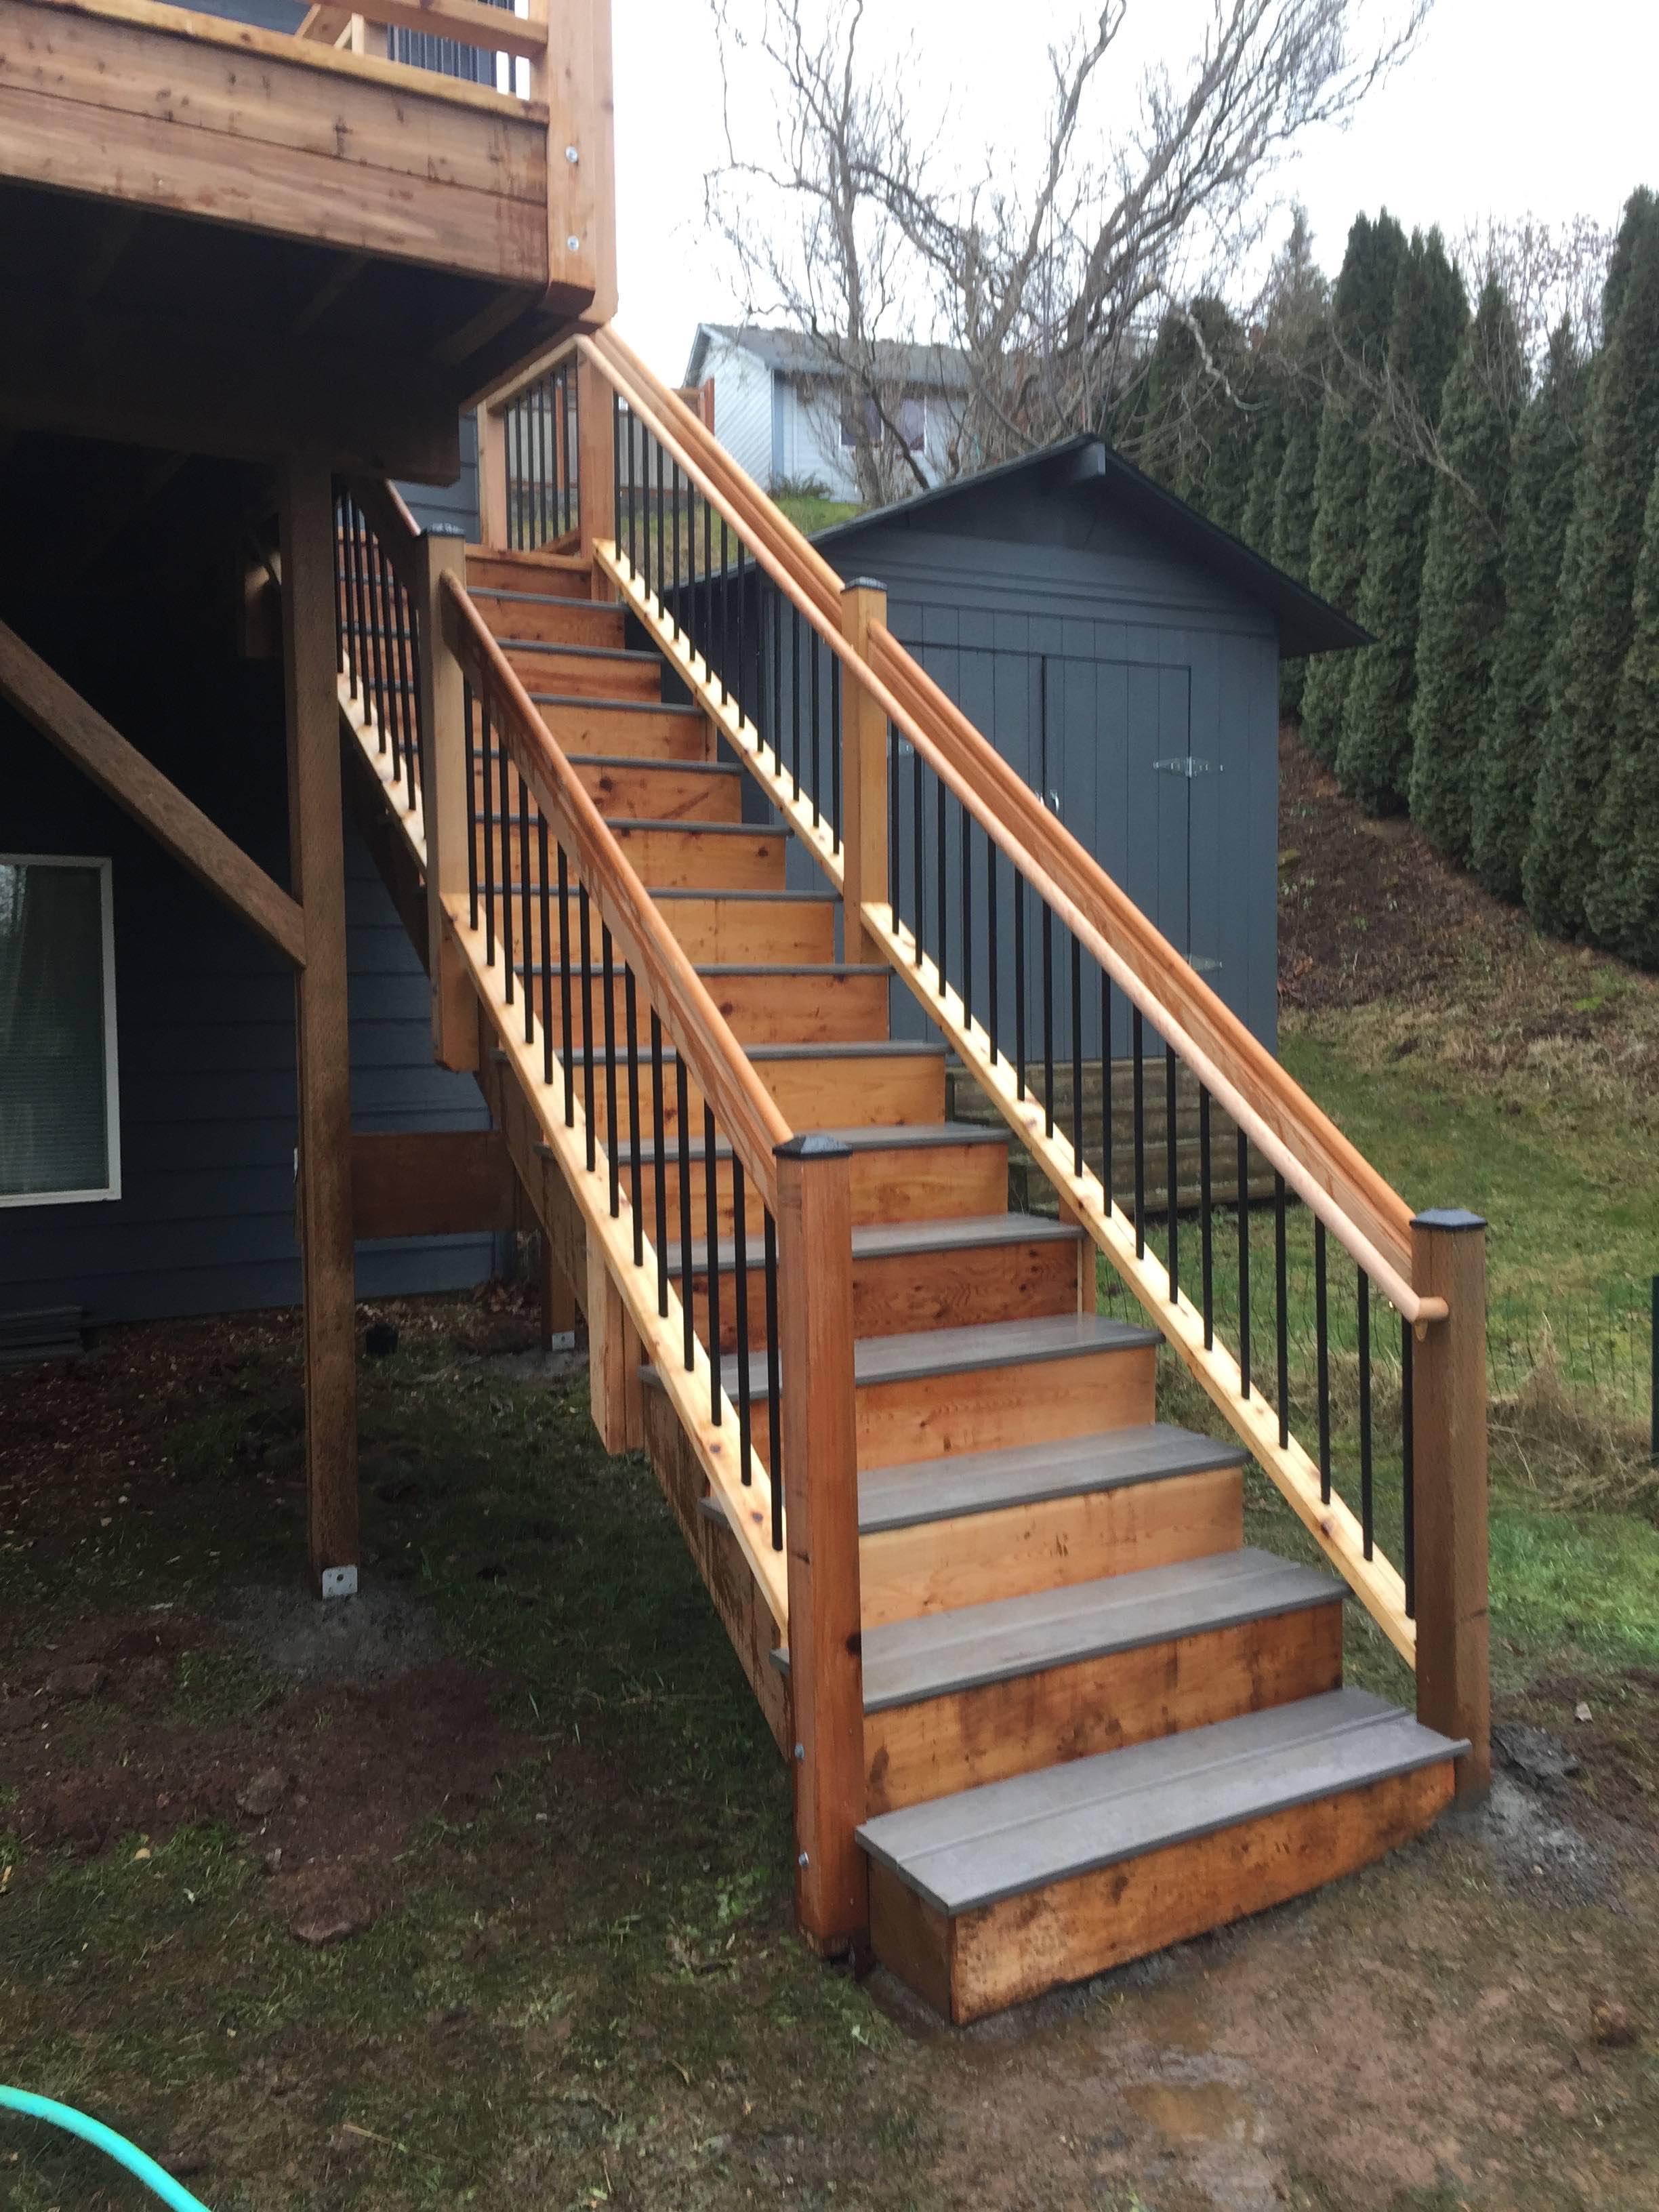 Timbertech Steps w/cedar rails and Dekorator pickets